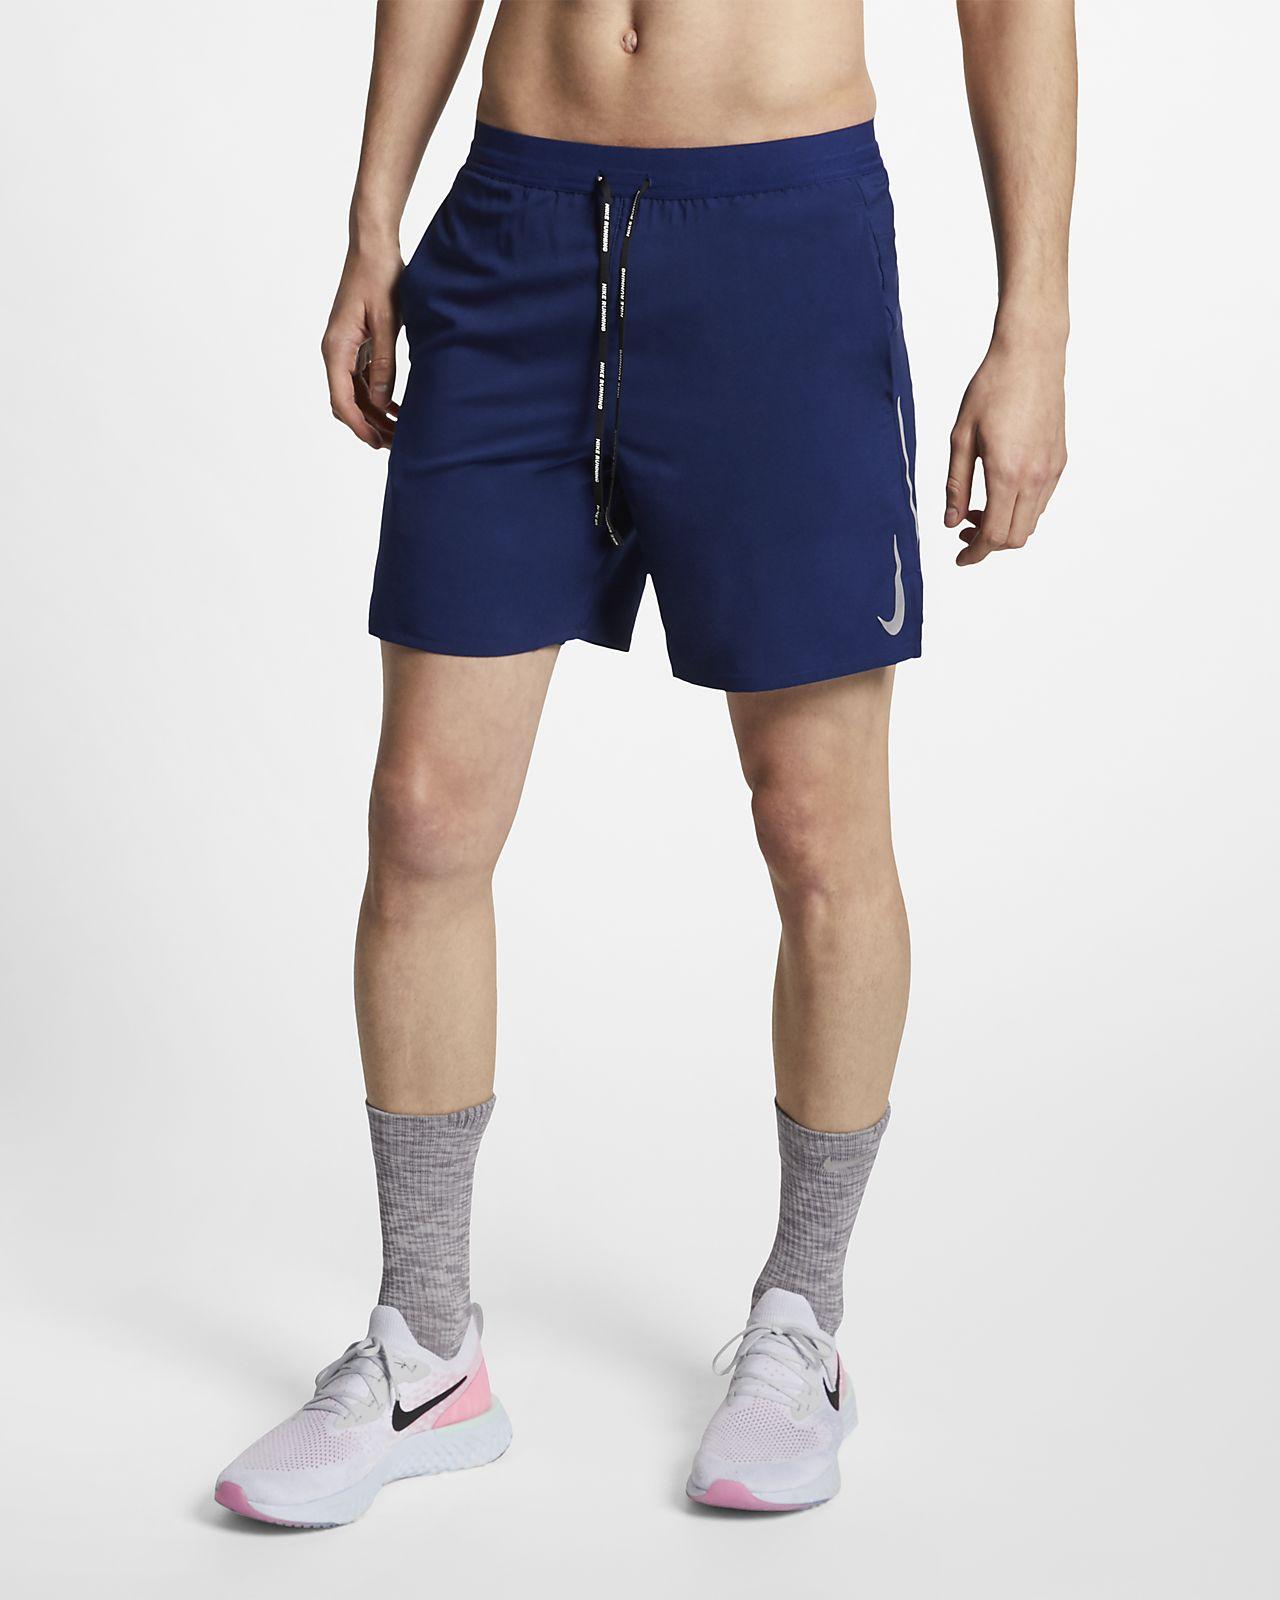 Nike Dri-FIT Flex Stride 2-i-1 løpeshorts til herre (18 cm)